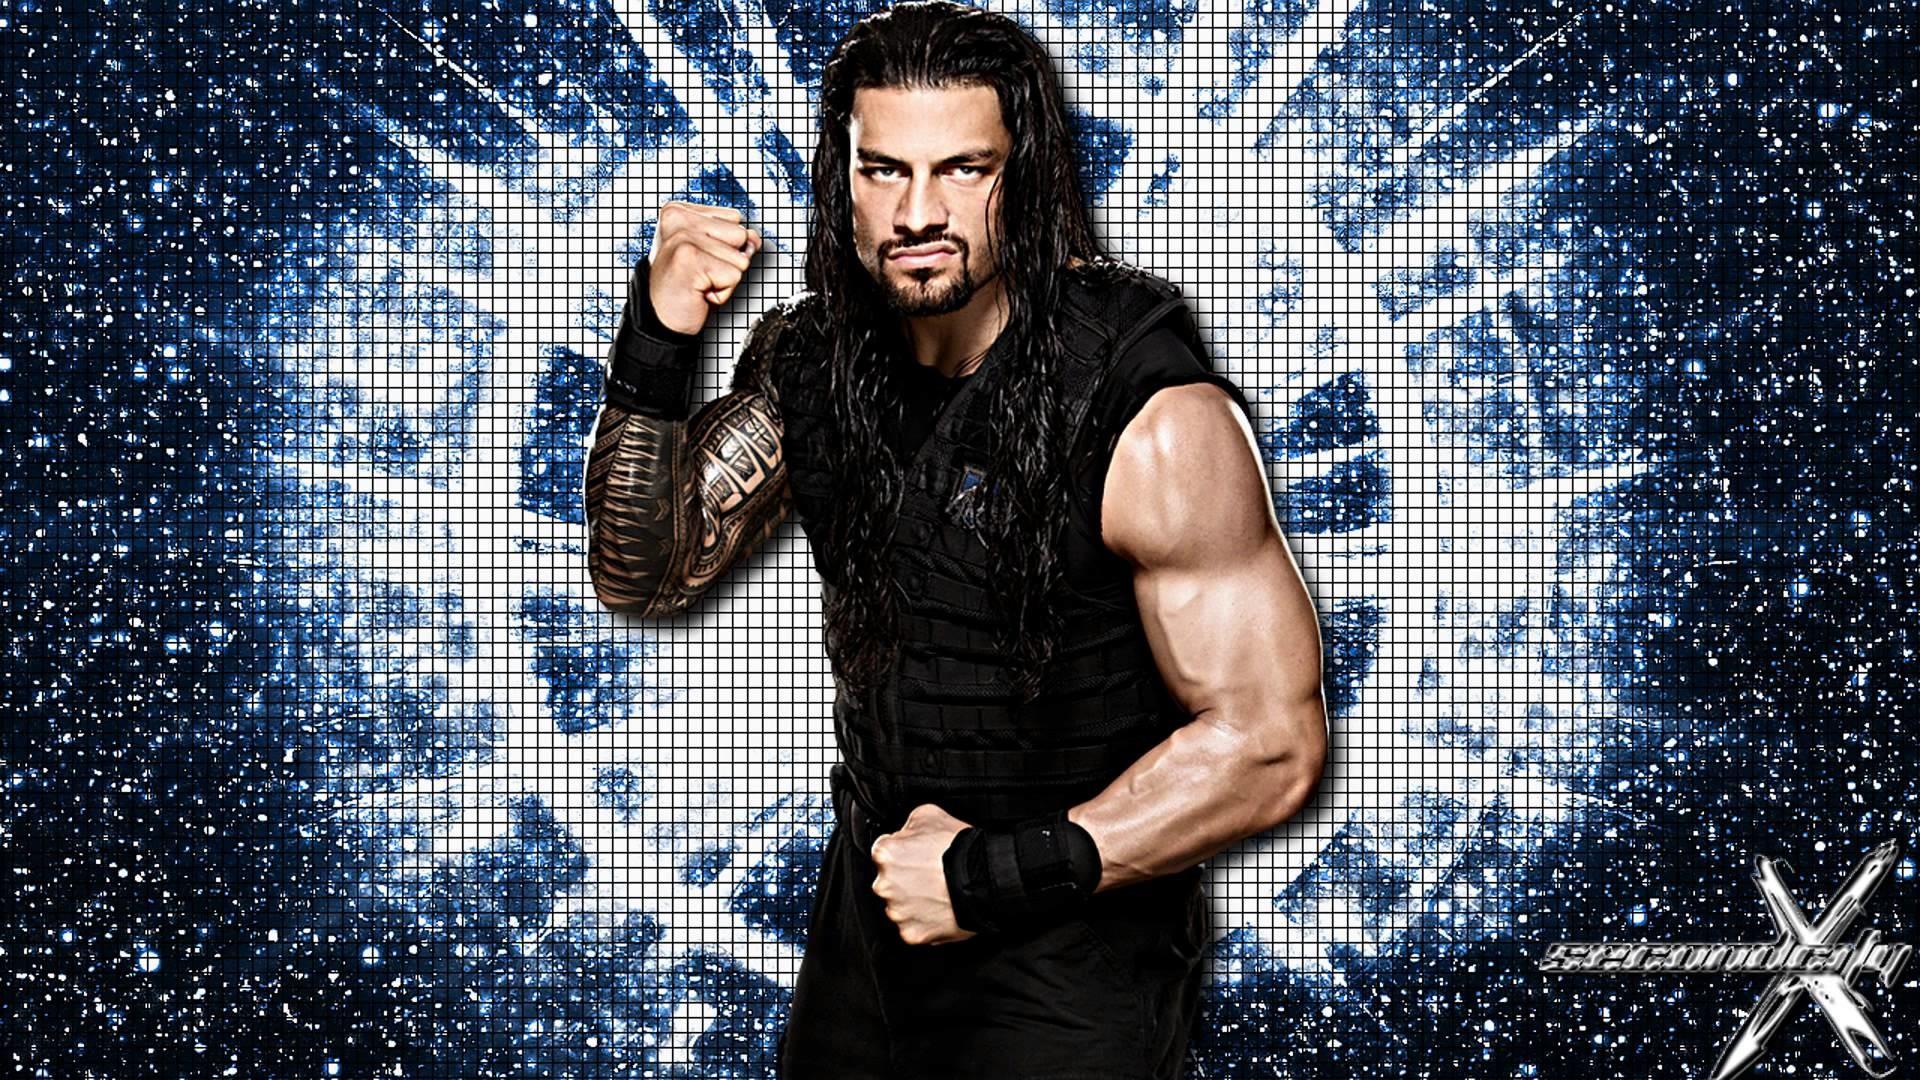 WWE Roman Reigns Wallpaper HD – WallpaperSafari